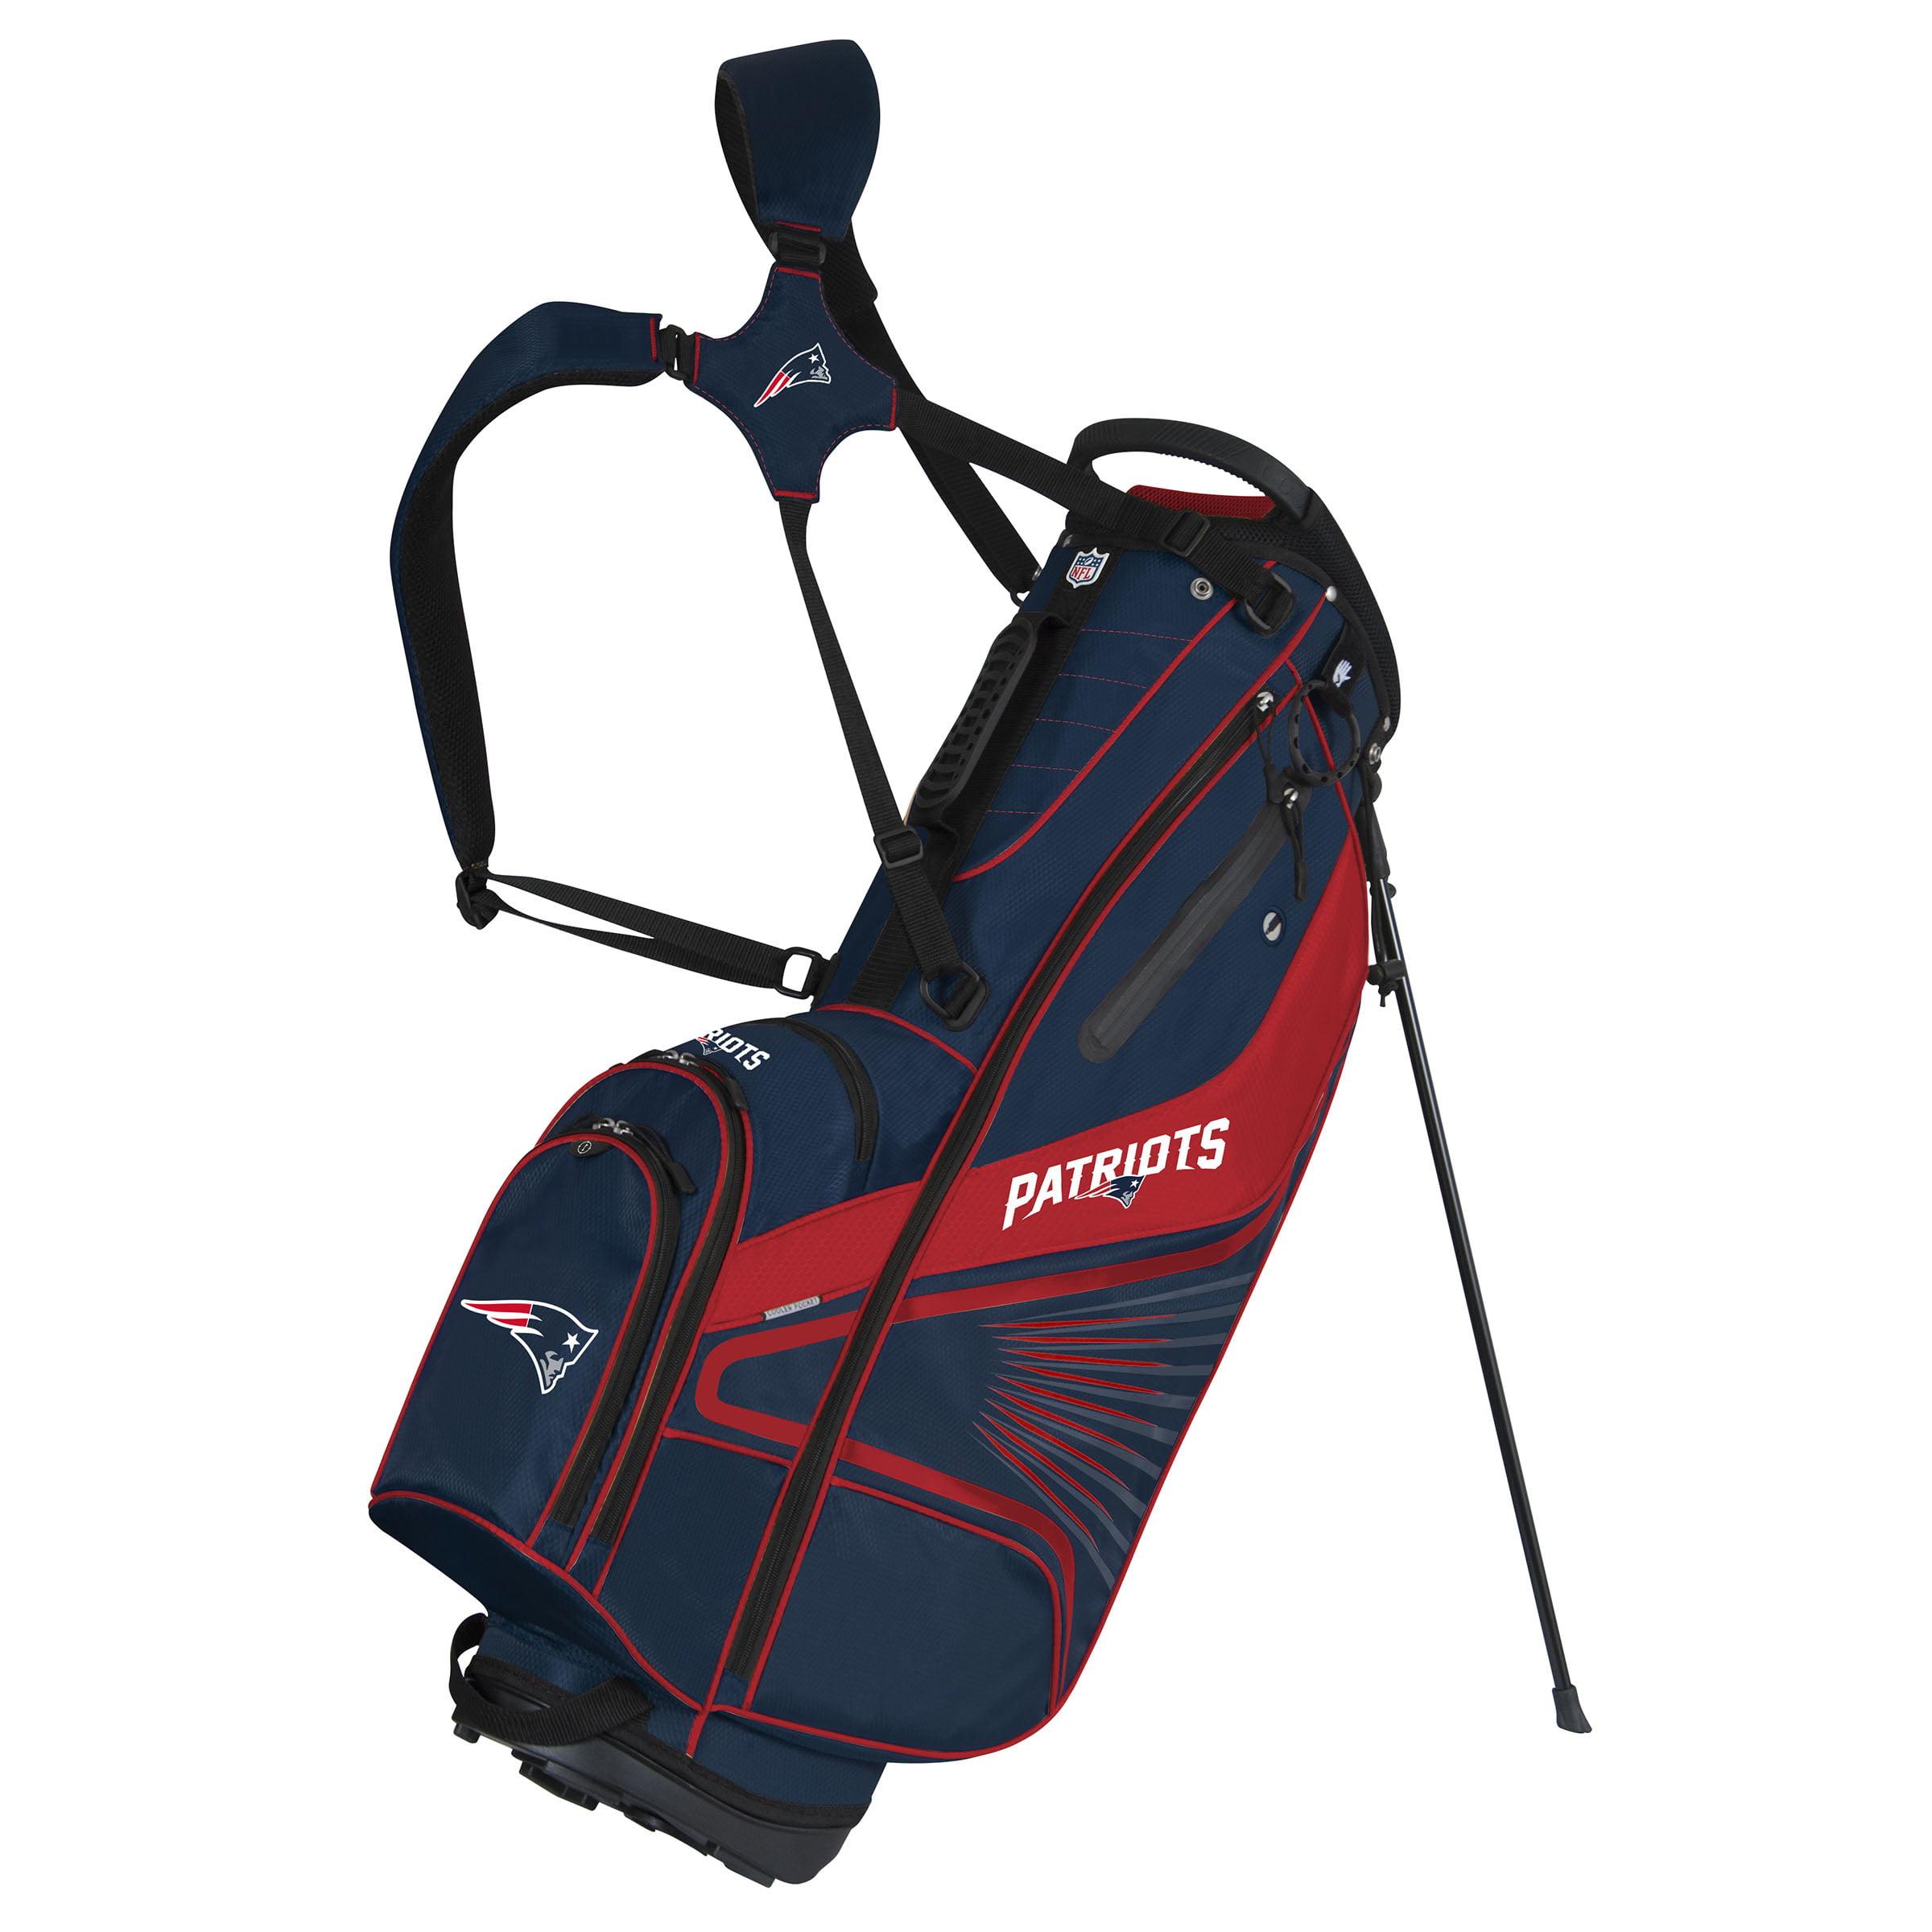 New England Patriots Gridiron III Stand Bag - No Size